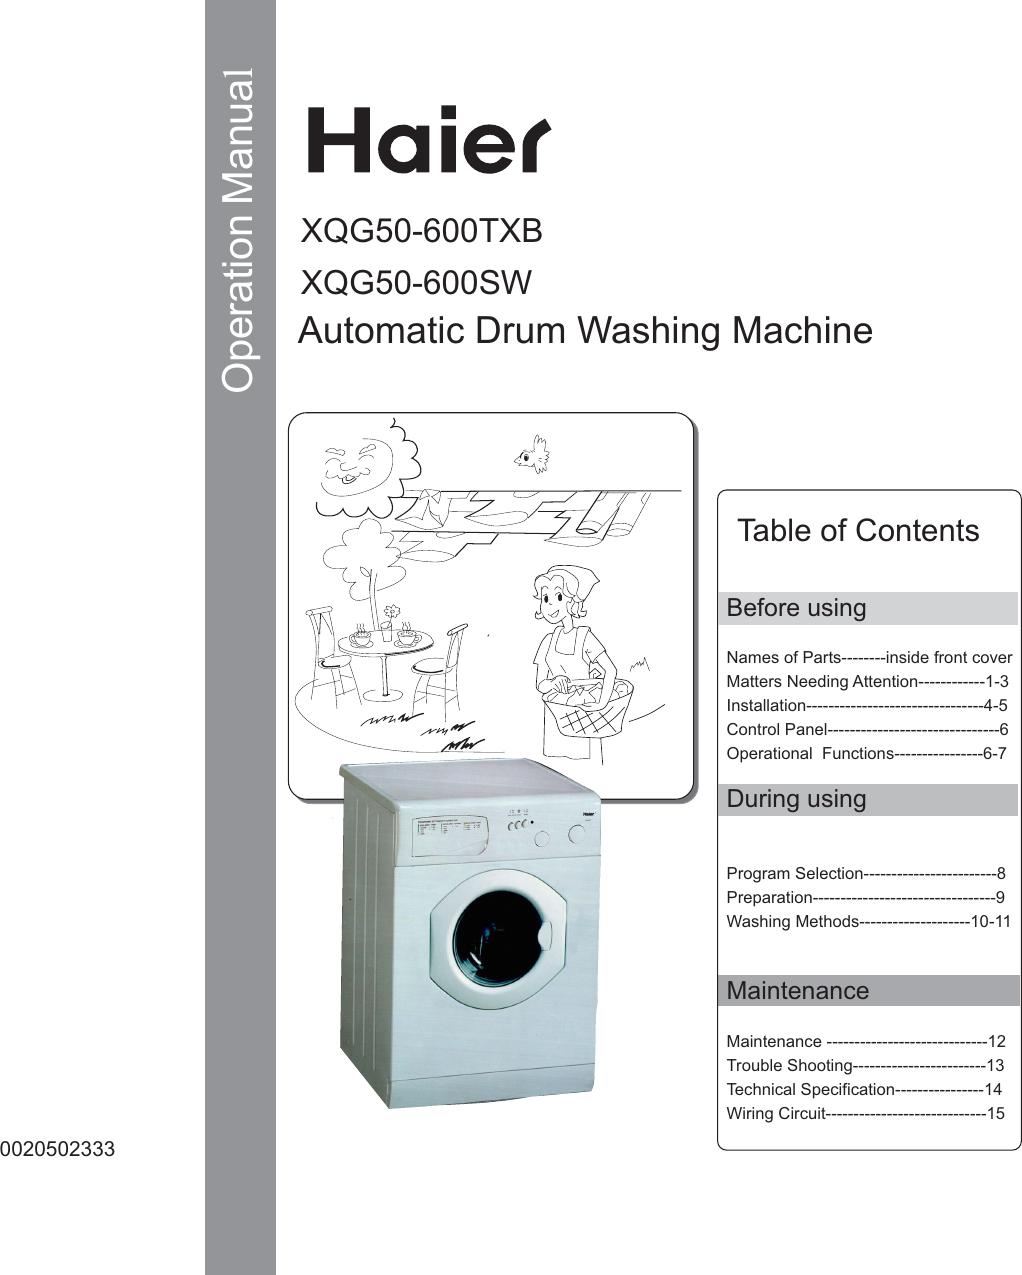 Haier XQG50 600TXB        1 User Manual To The 029890ee 4402